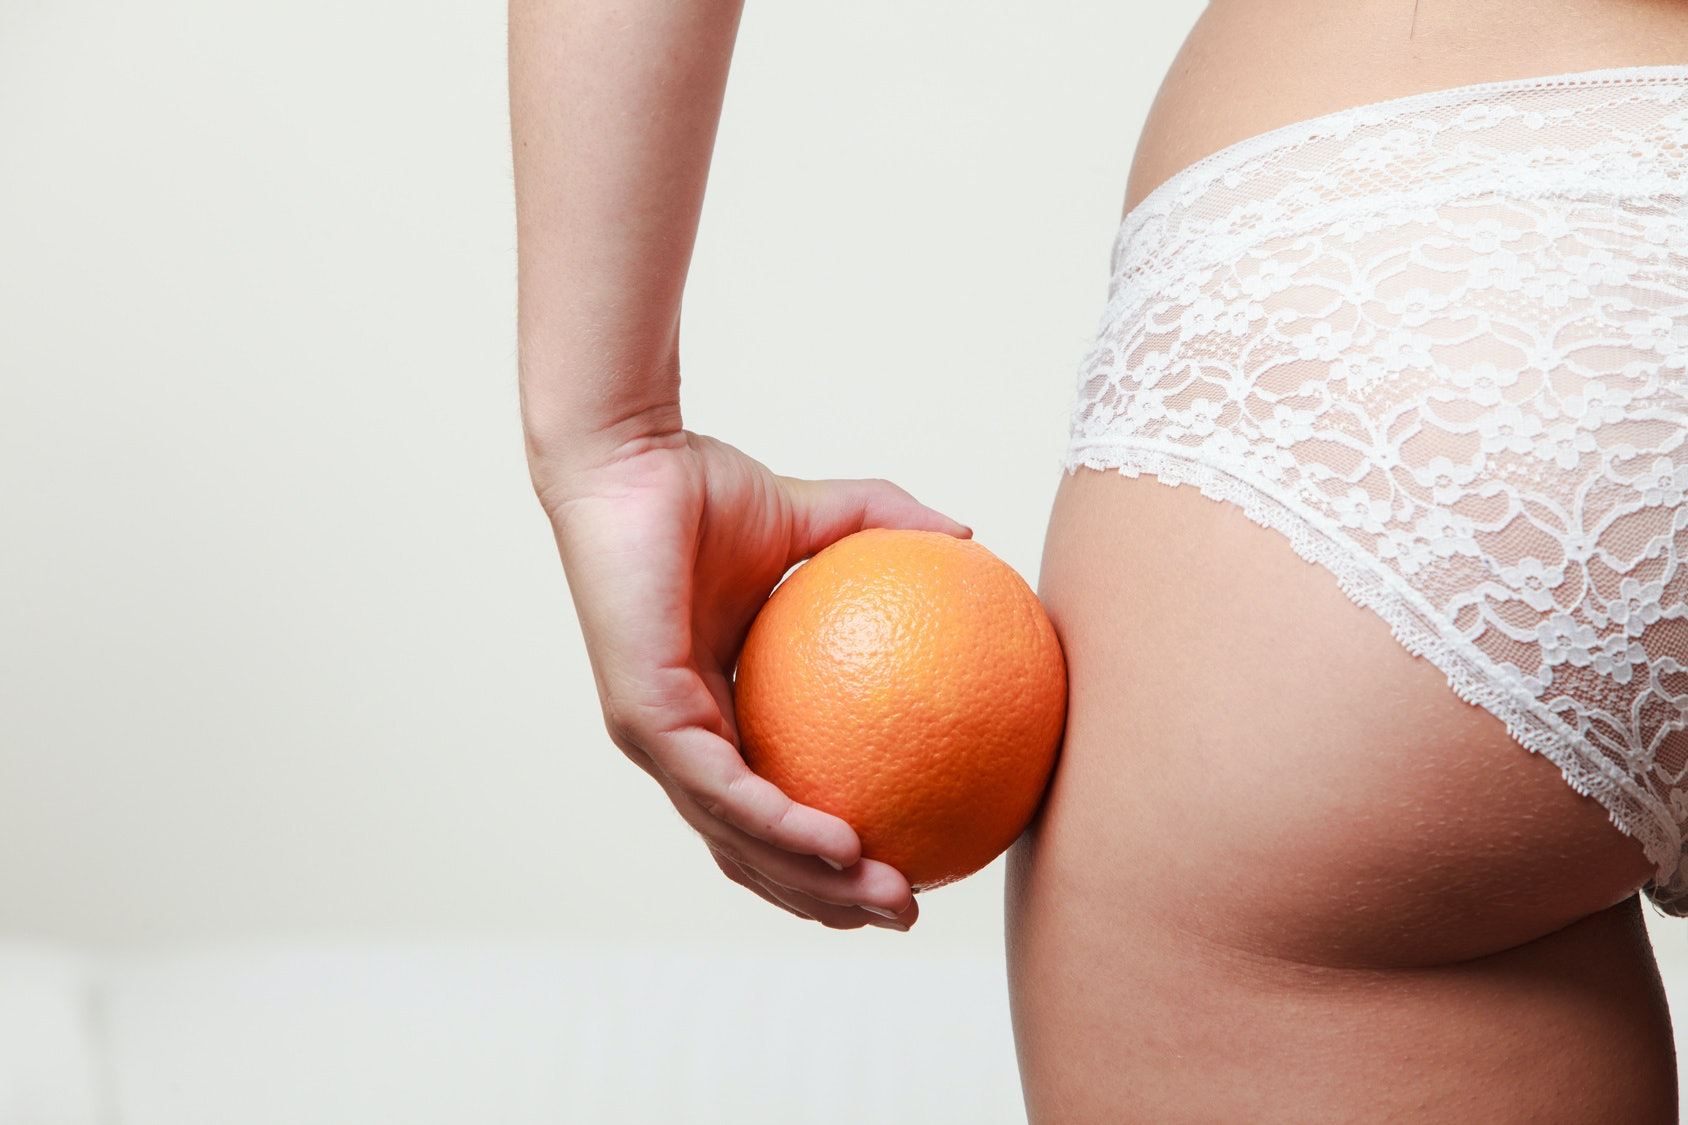 Gaping anal sex porn